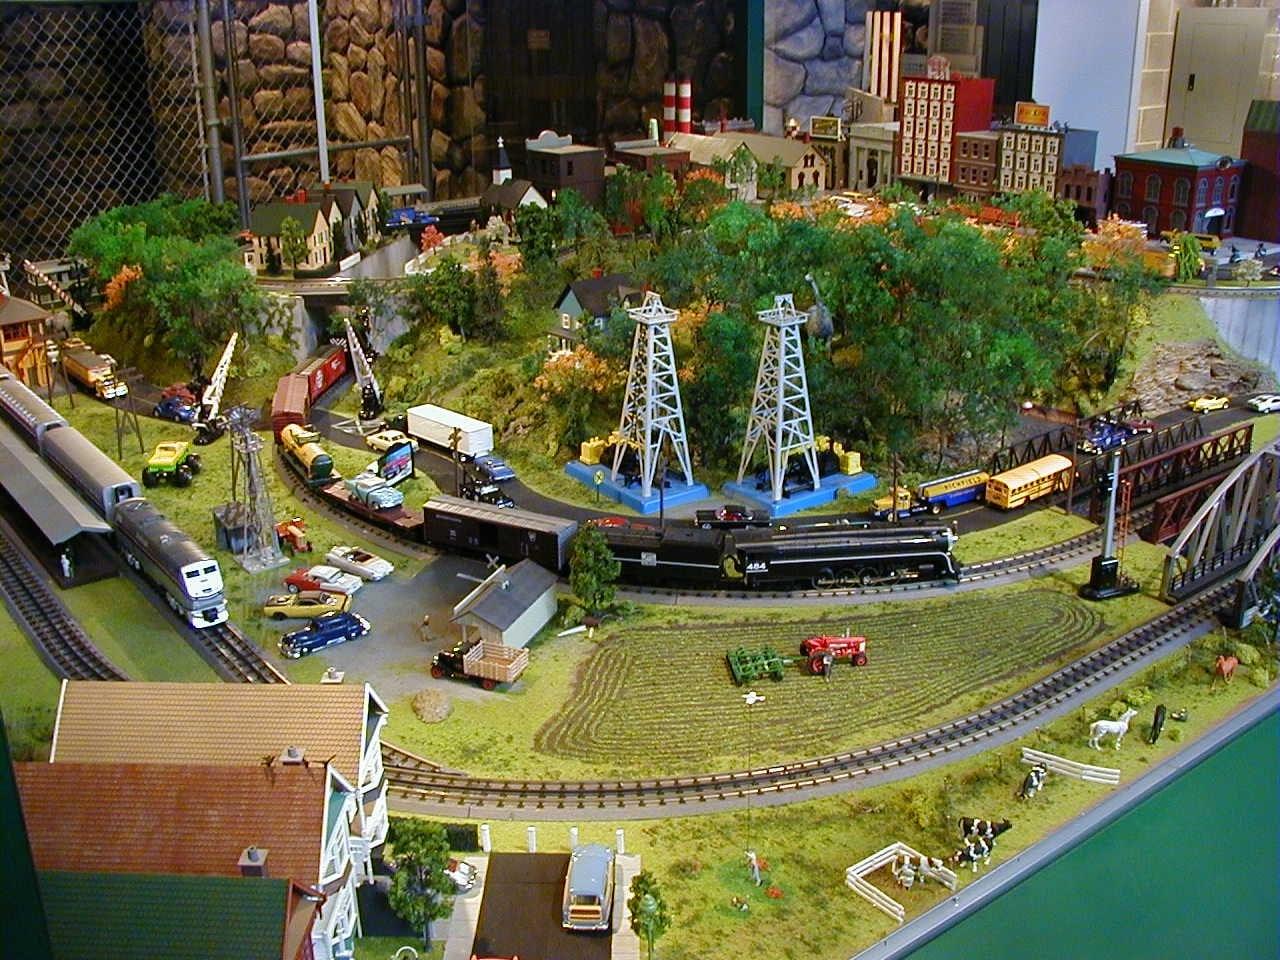 Donalds Wonderful 12 x 13 O Scale Model Train Photo Gallery